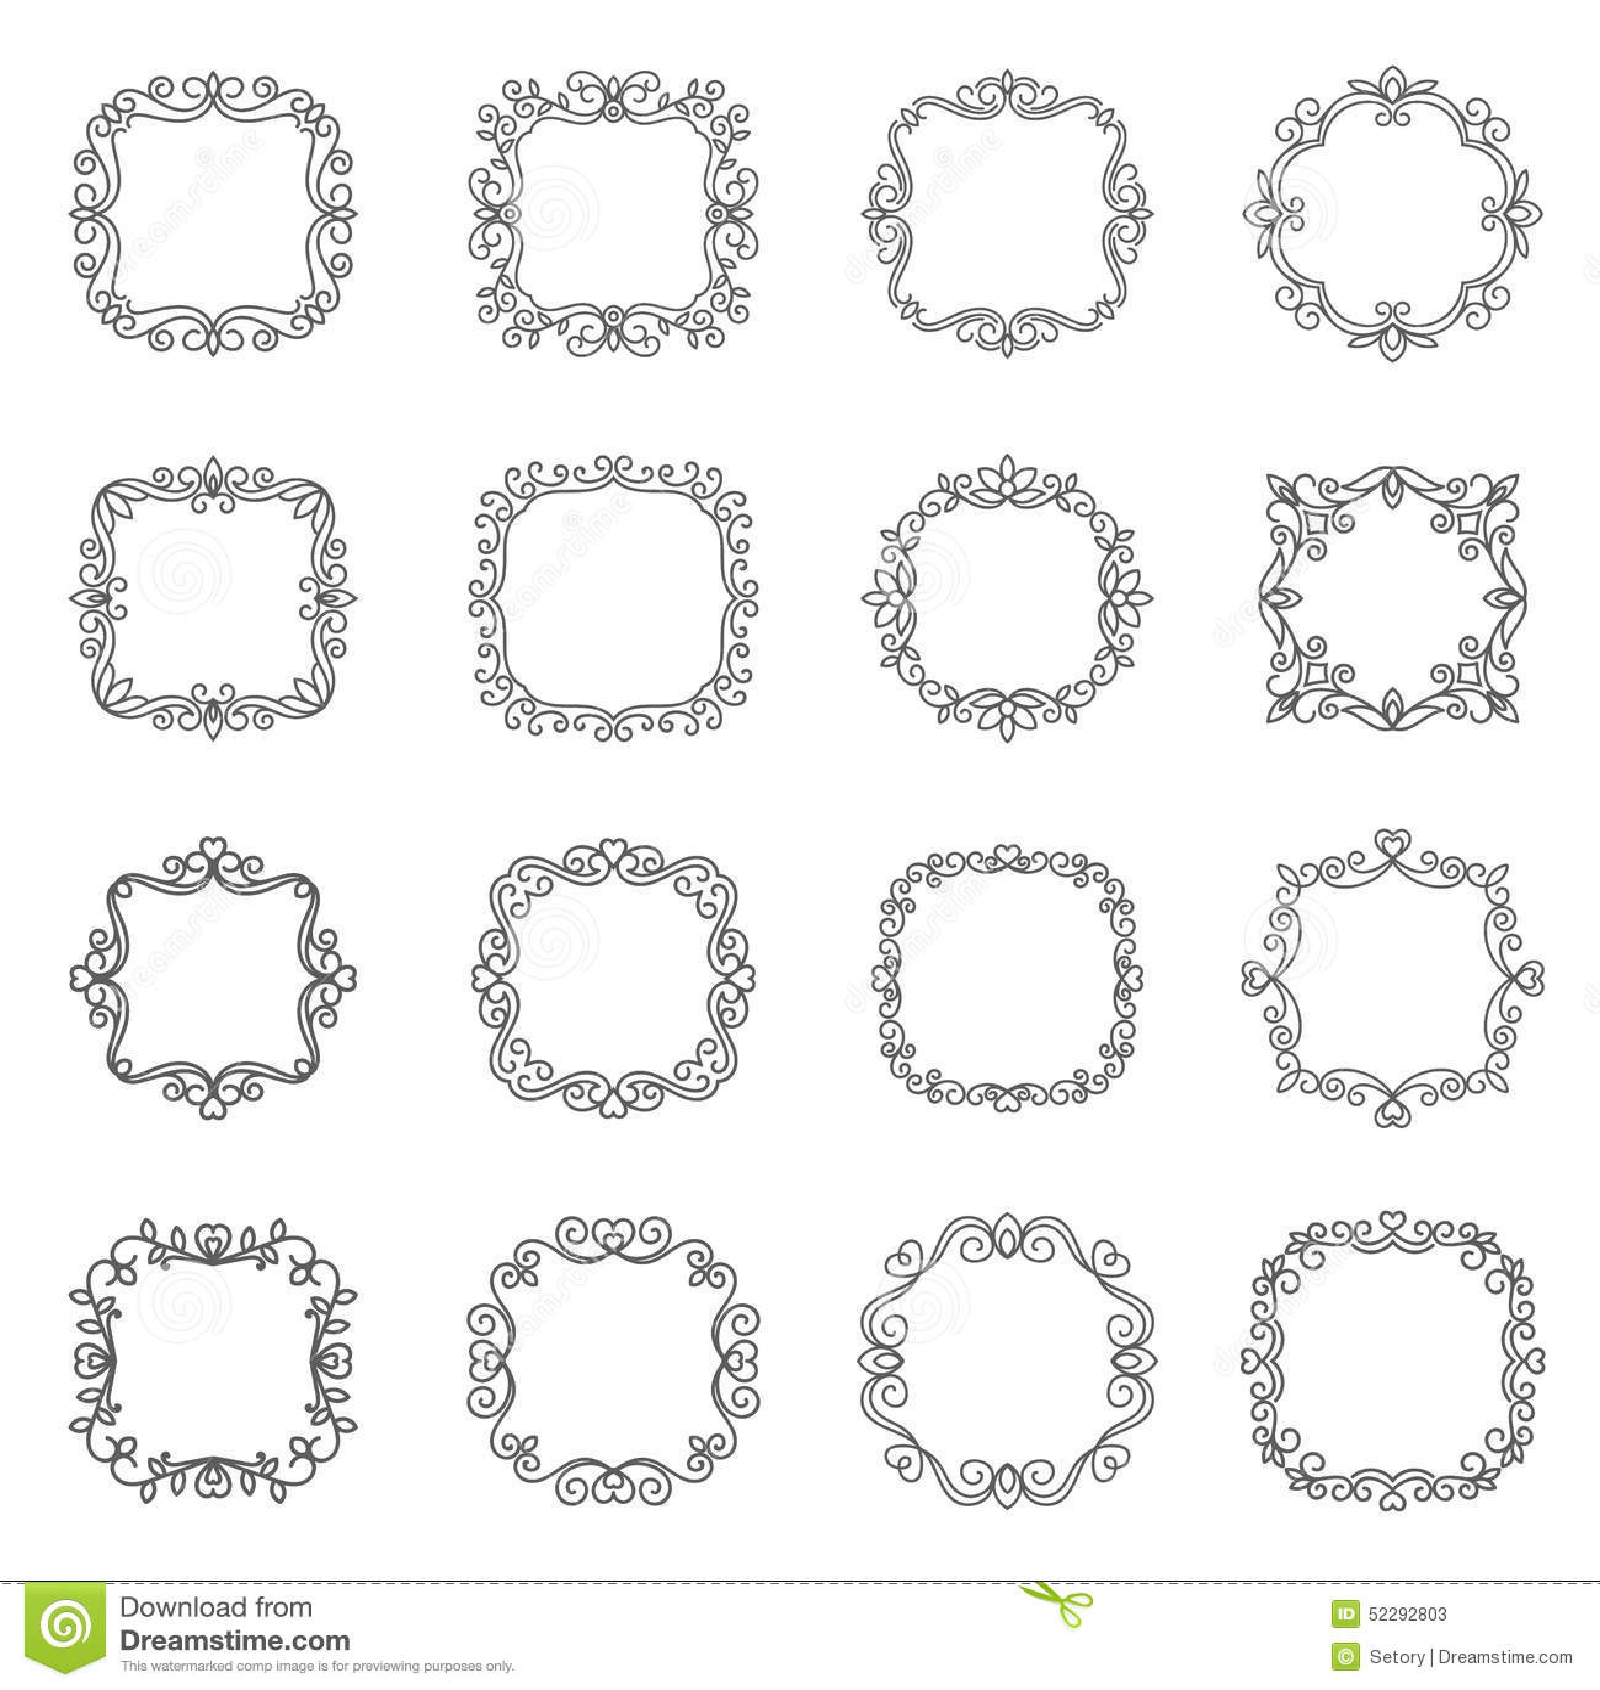 Set outline frame stock vector. Illustration of organic - 52292803